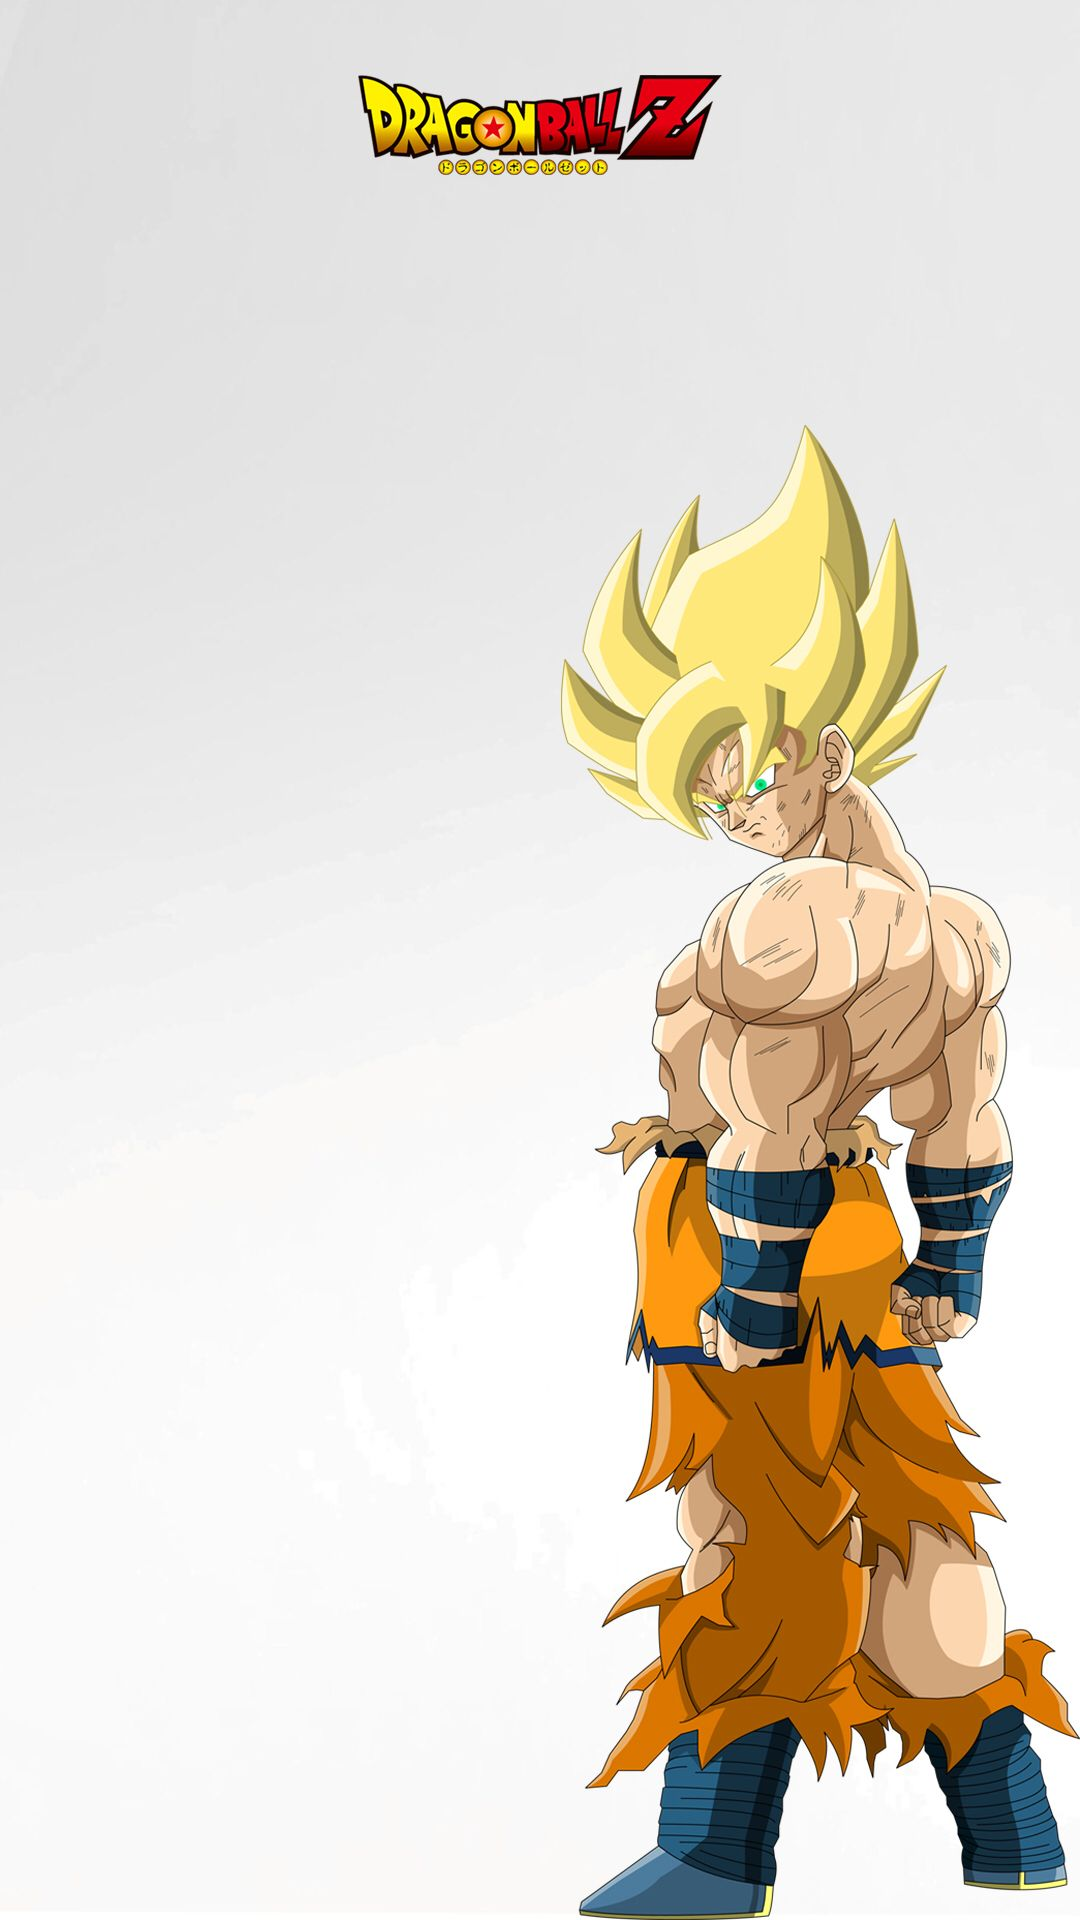 Goku ssj iphone 6 wallpaper dragon ball pinterest - Dragon ball z live wallpaper iphone ...